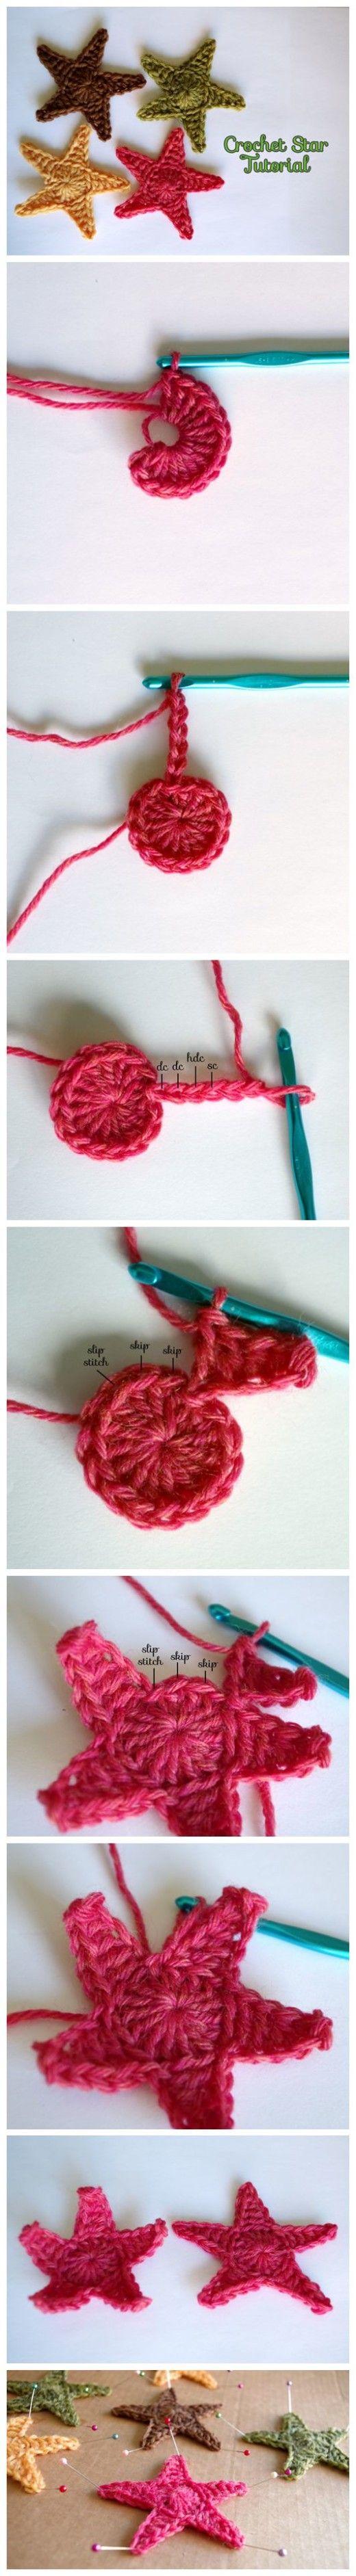 How to make a crochet star DIY